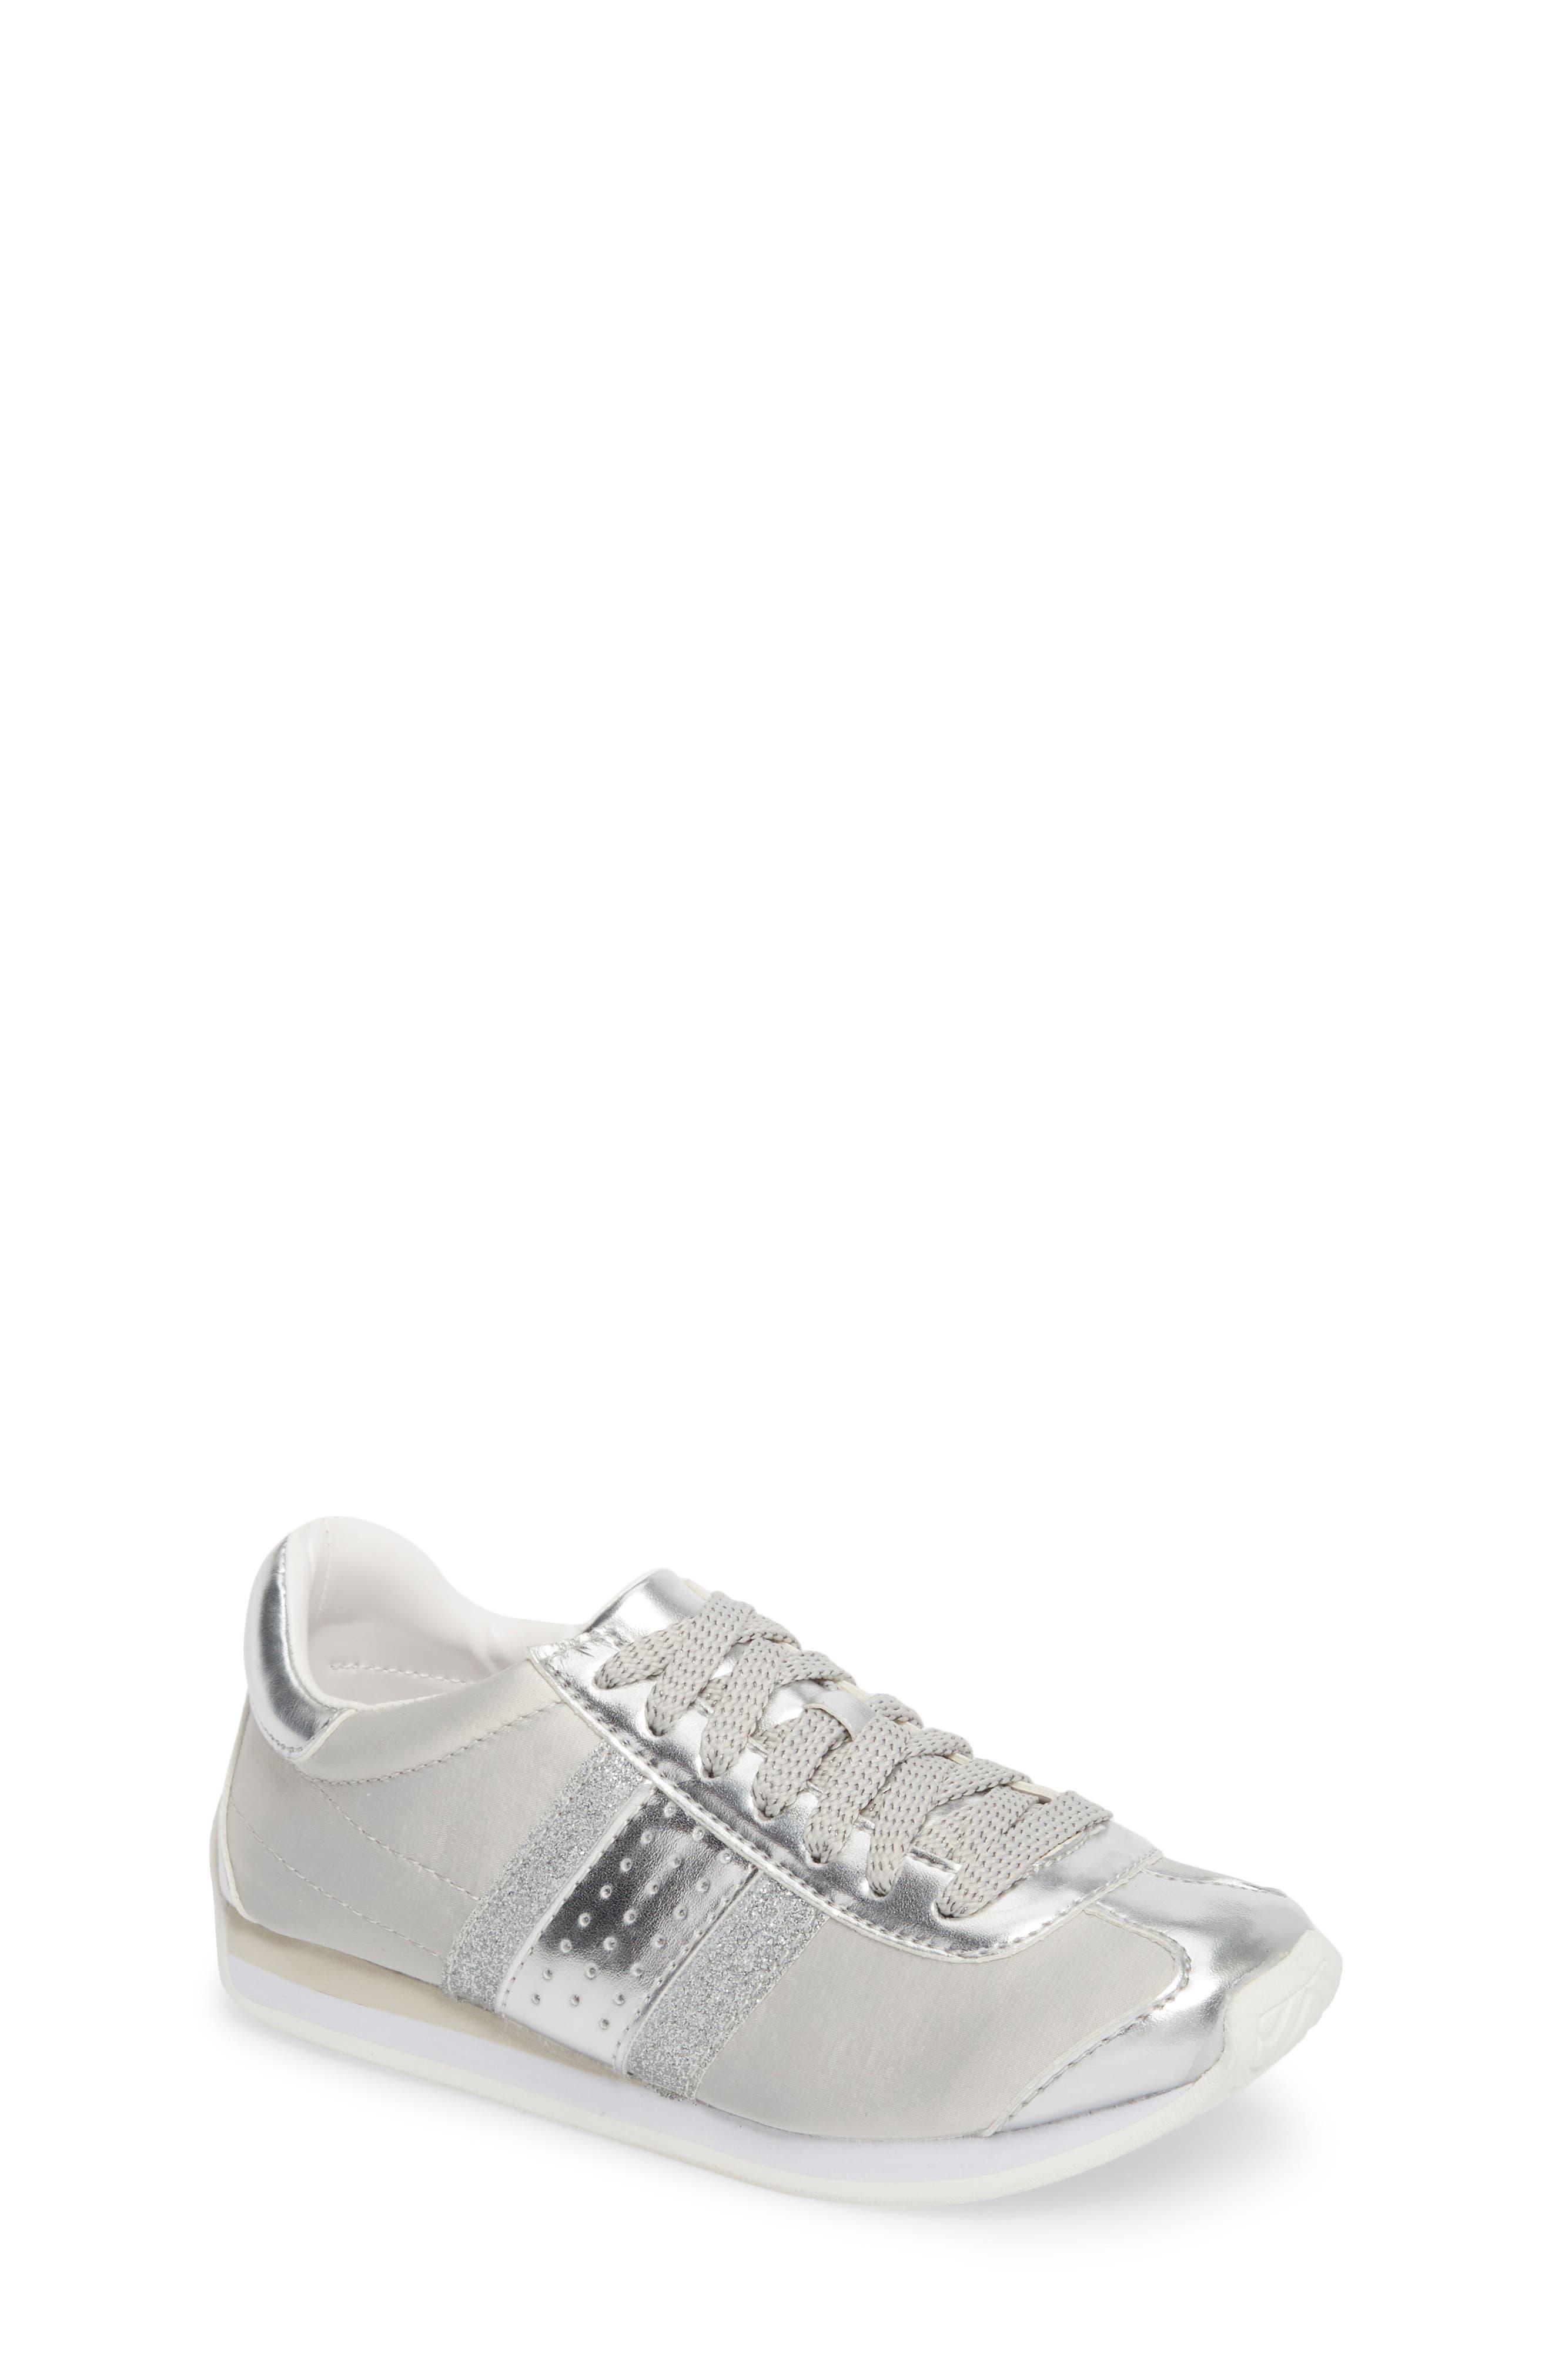 John Sneaker,                             Main thumbnail 1, color,                             020